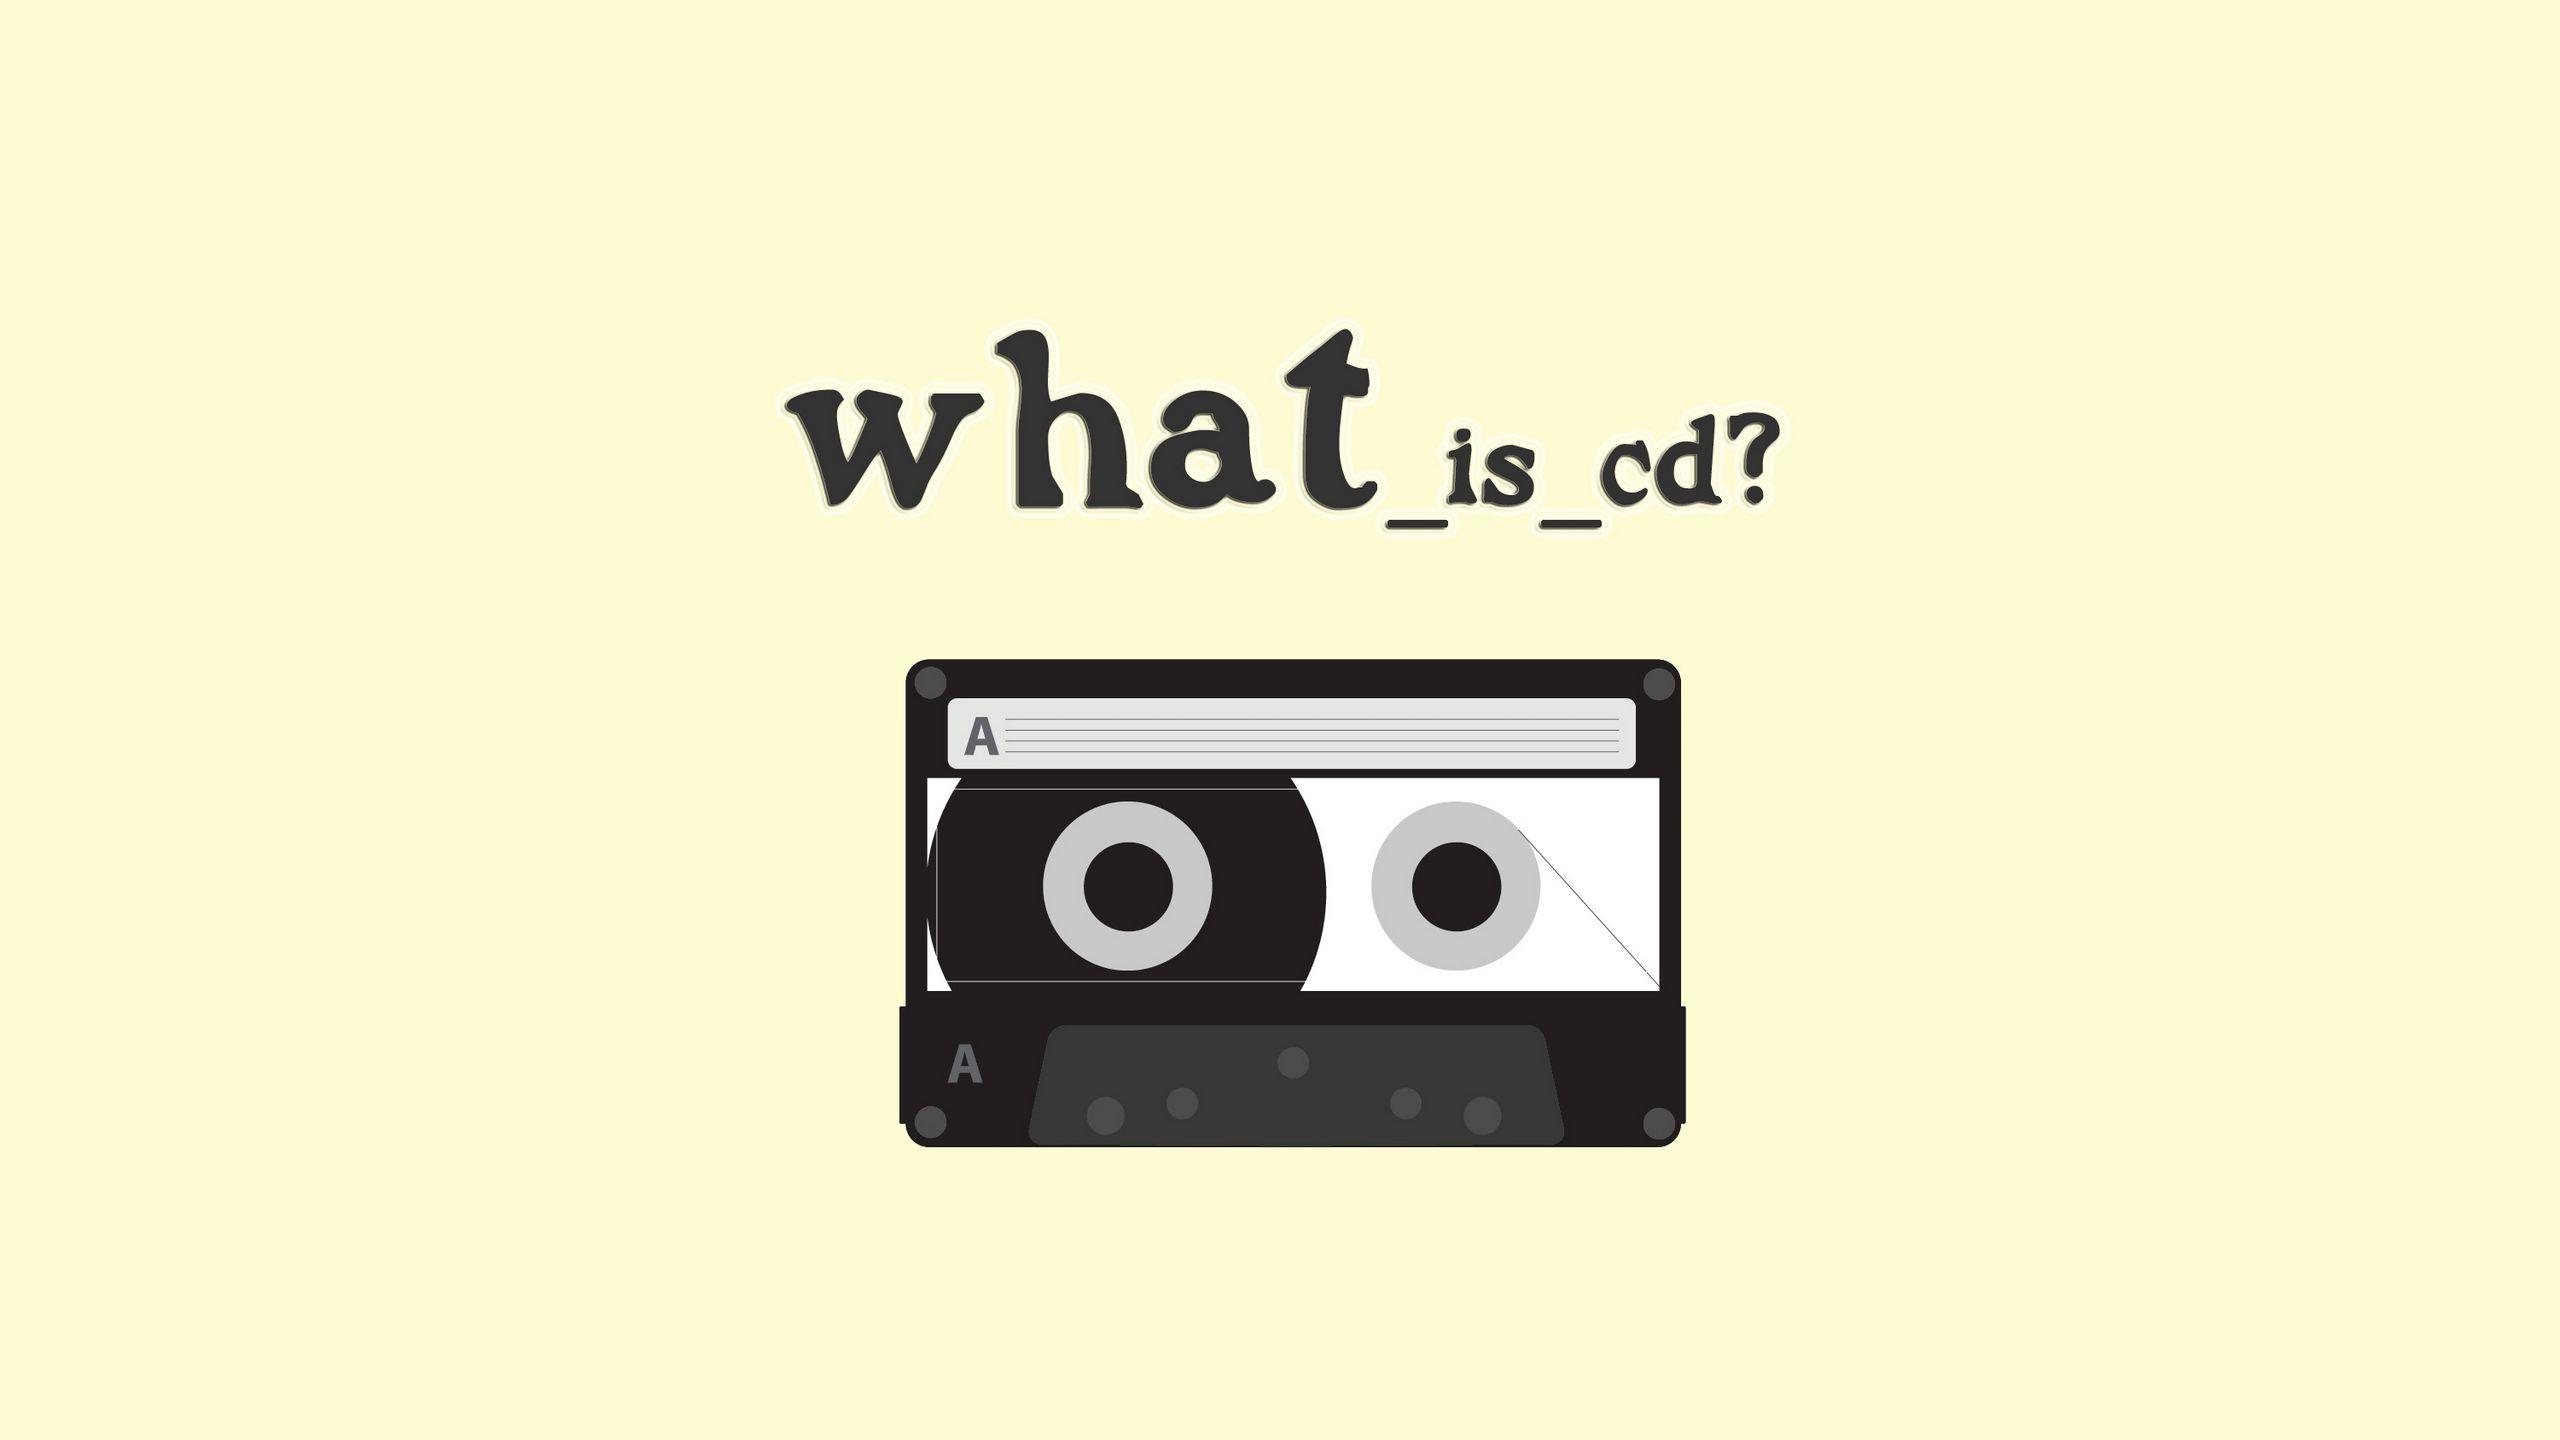 2560x1440 Обои плёнка, жёлтый, кассета, вопрос